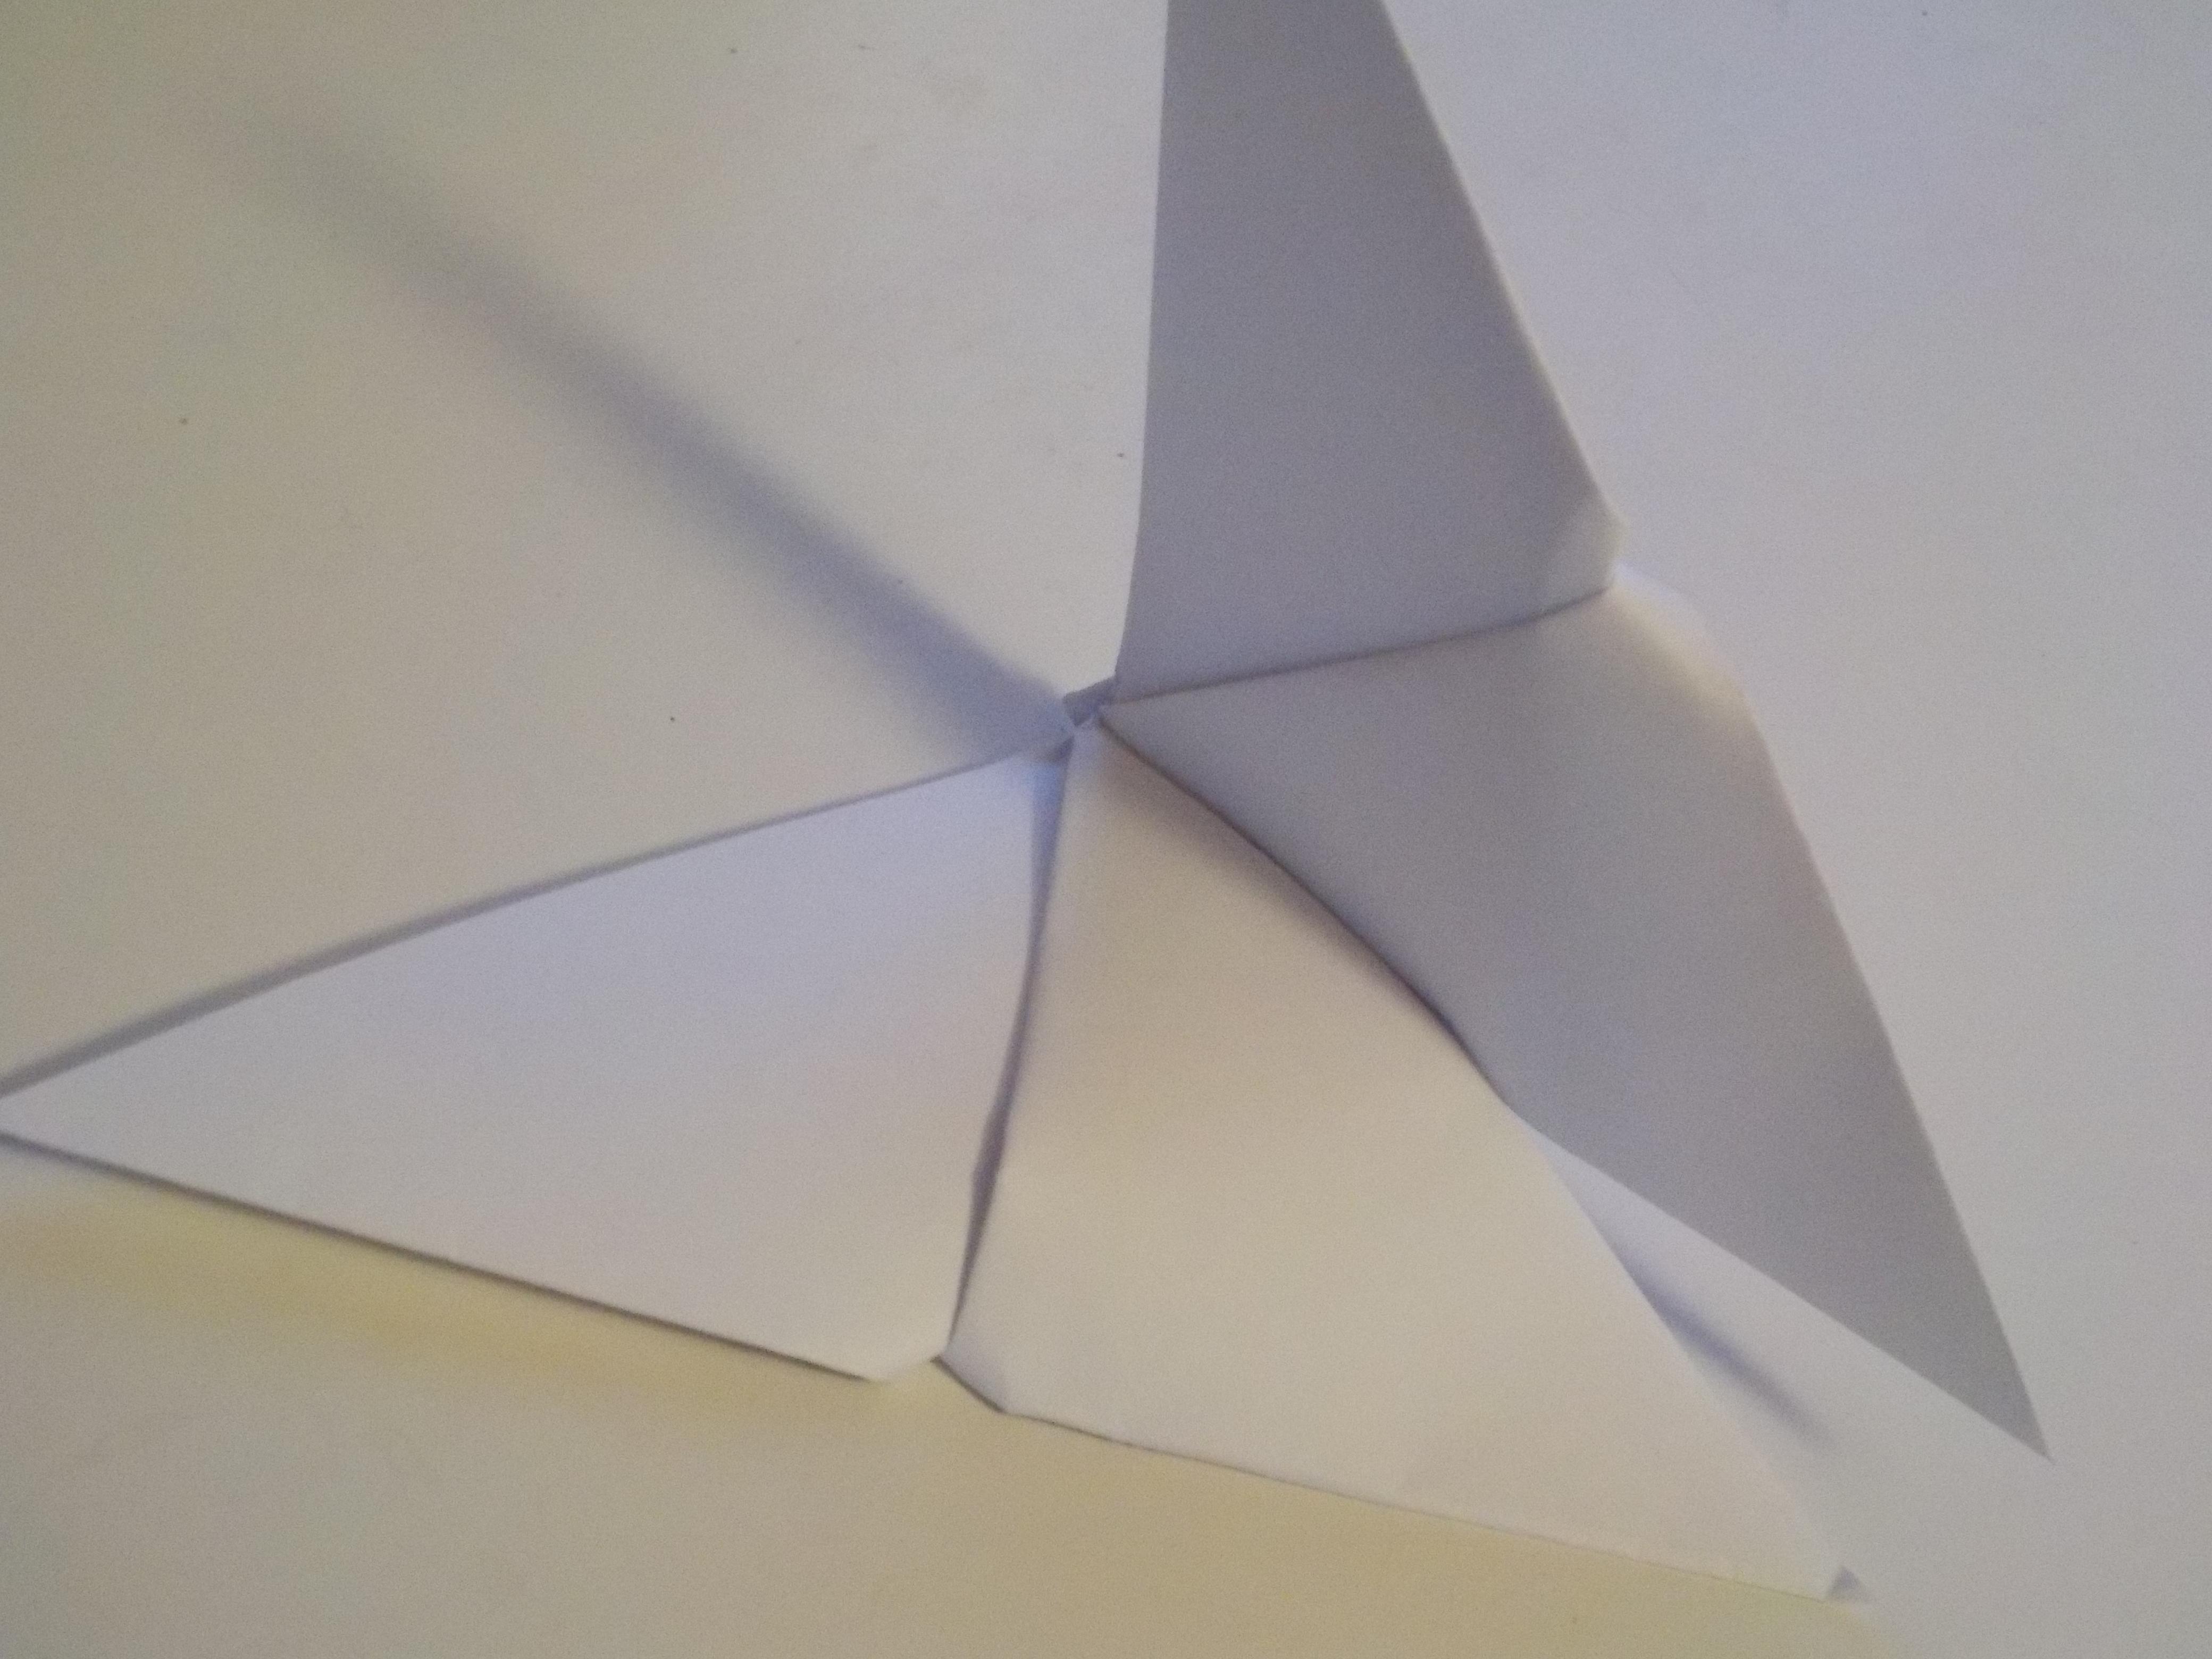 origami le papillon facile rapide et mignon 1 made. Black Bedroom Furniture Sets. Home Design Ideas